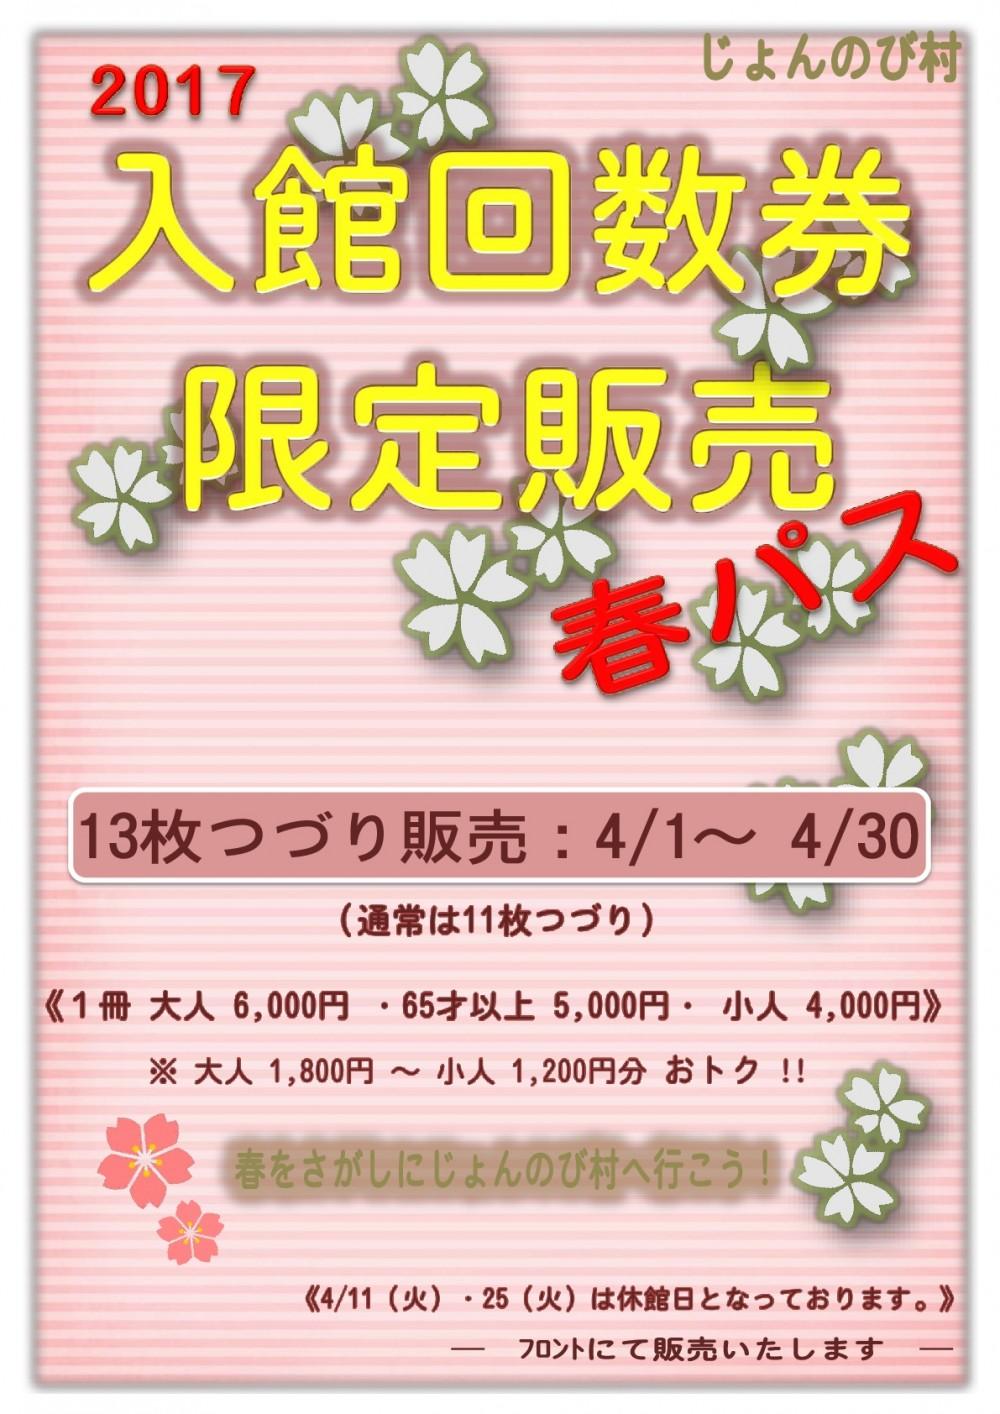 h29.4 13枚綴り春パスPOP-001